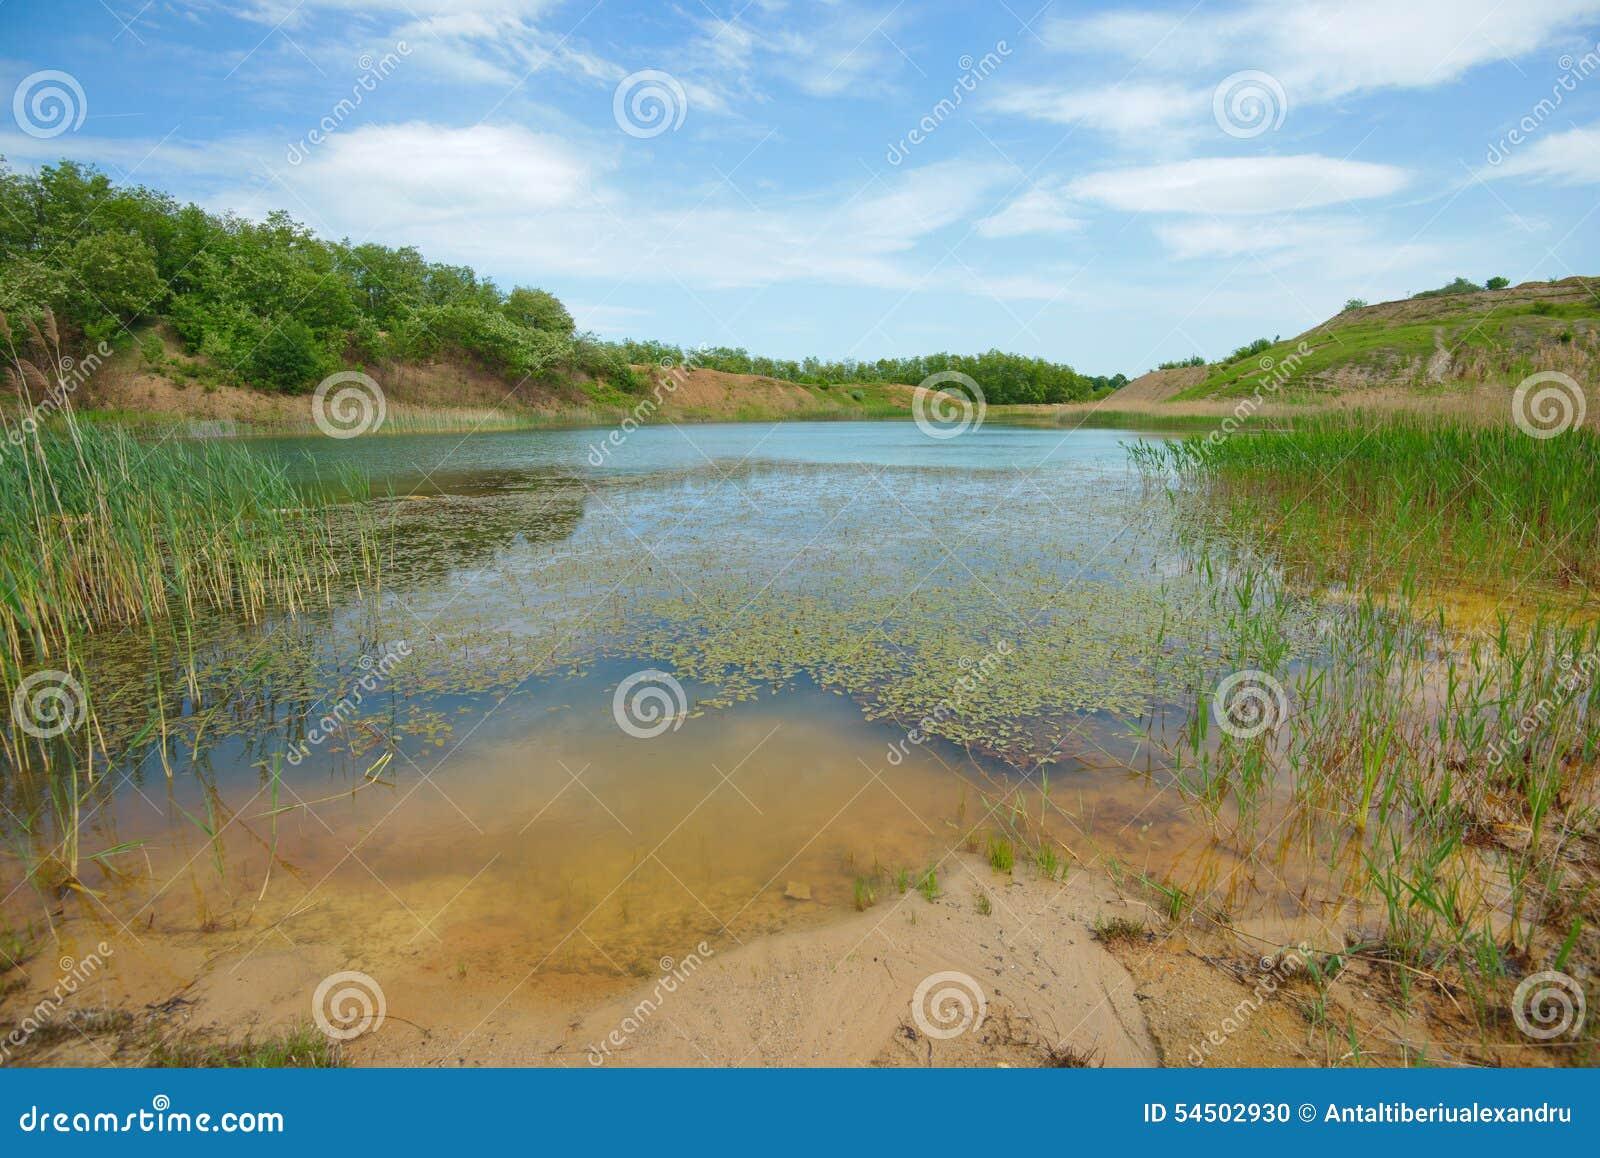 Paysage du lac bleu lagoon